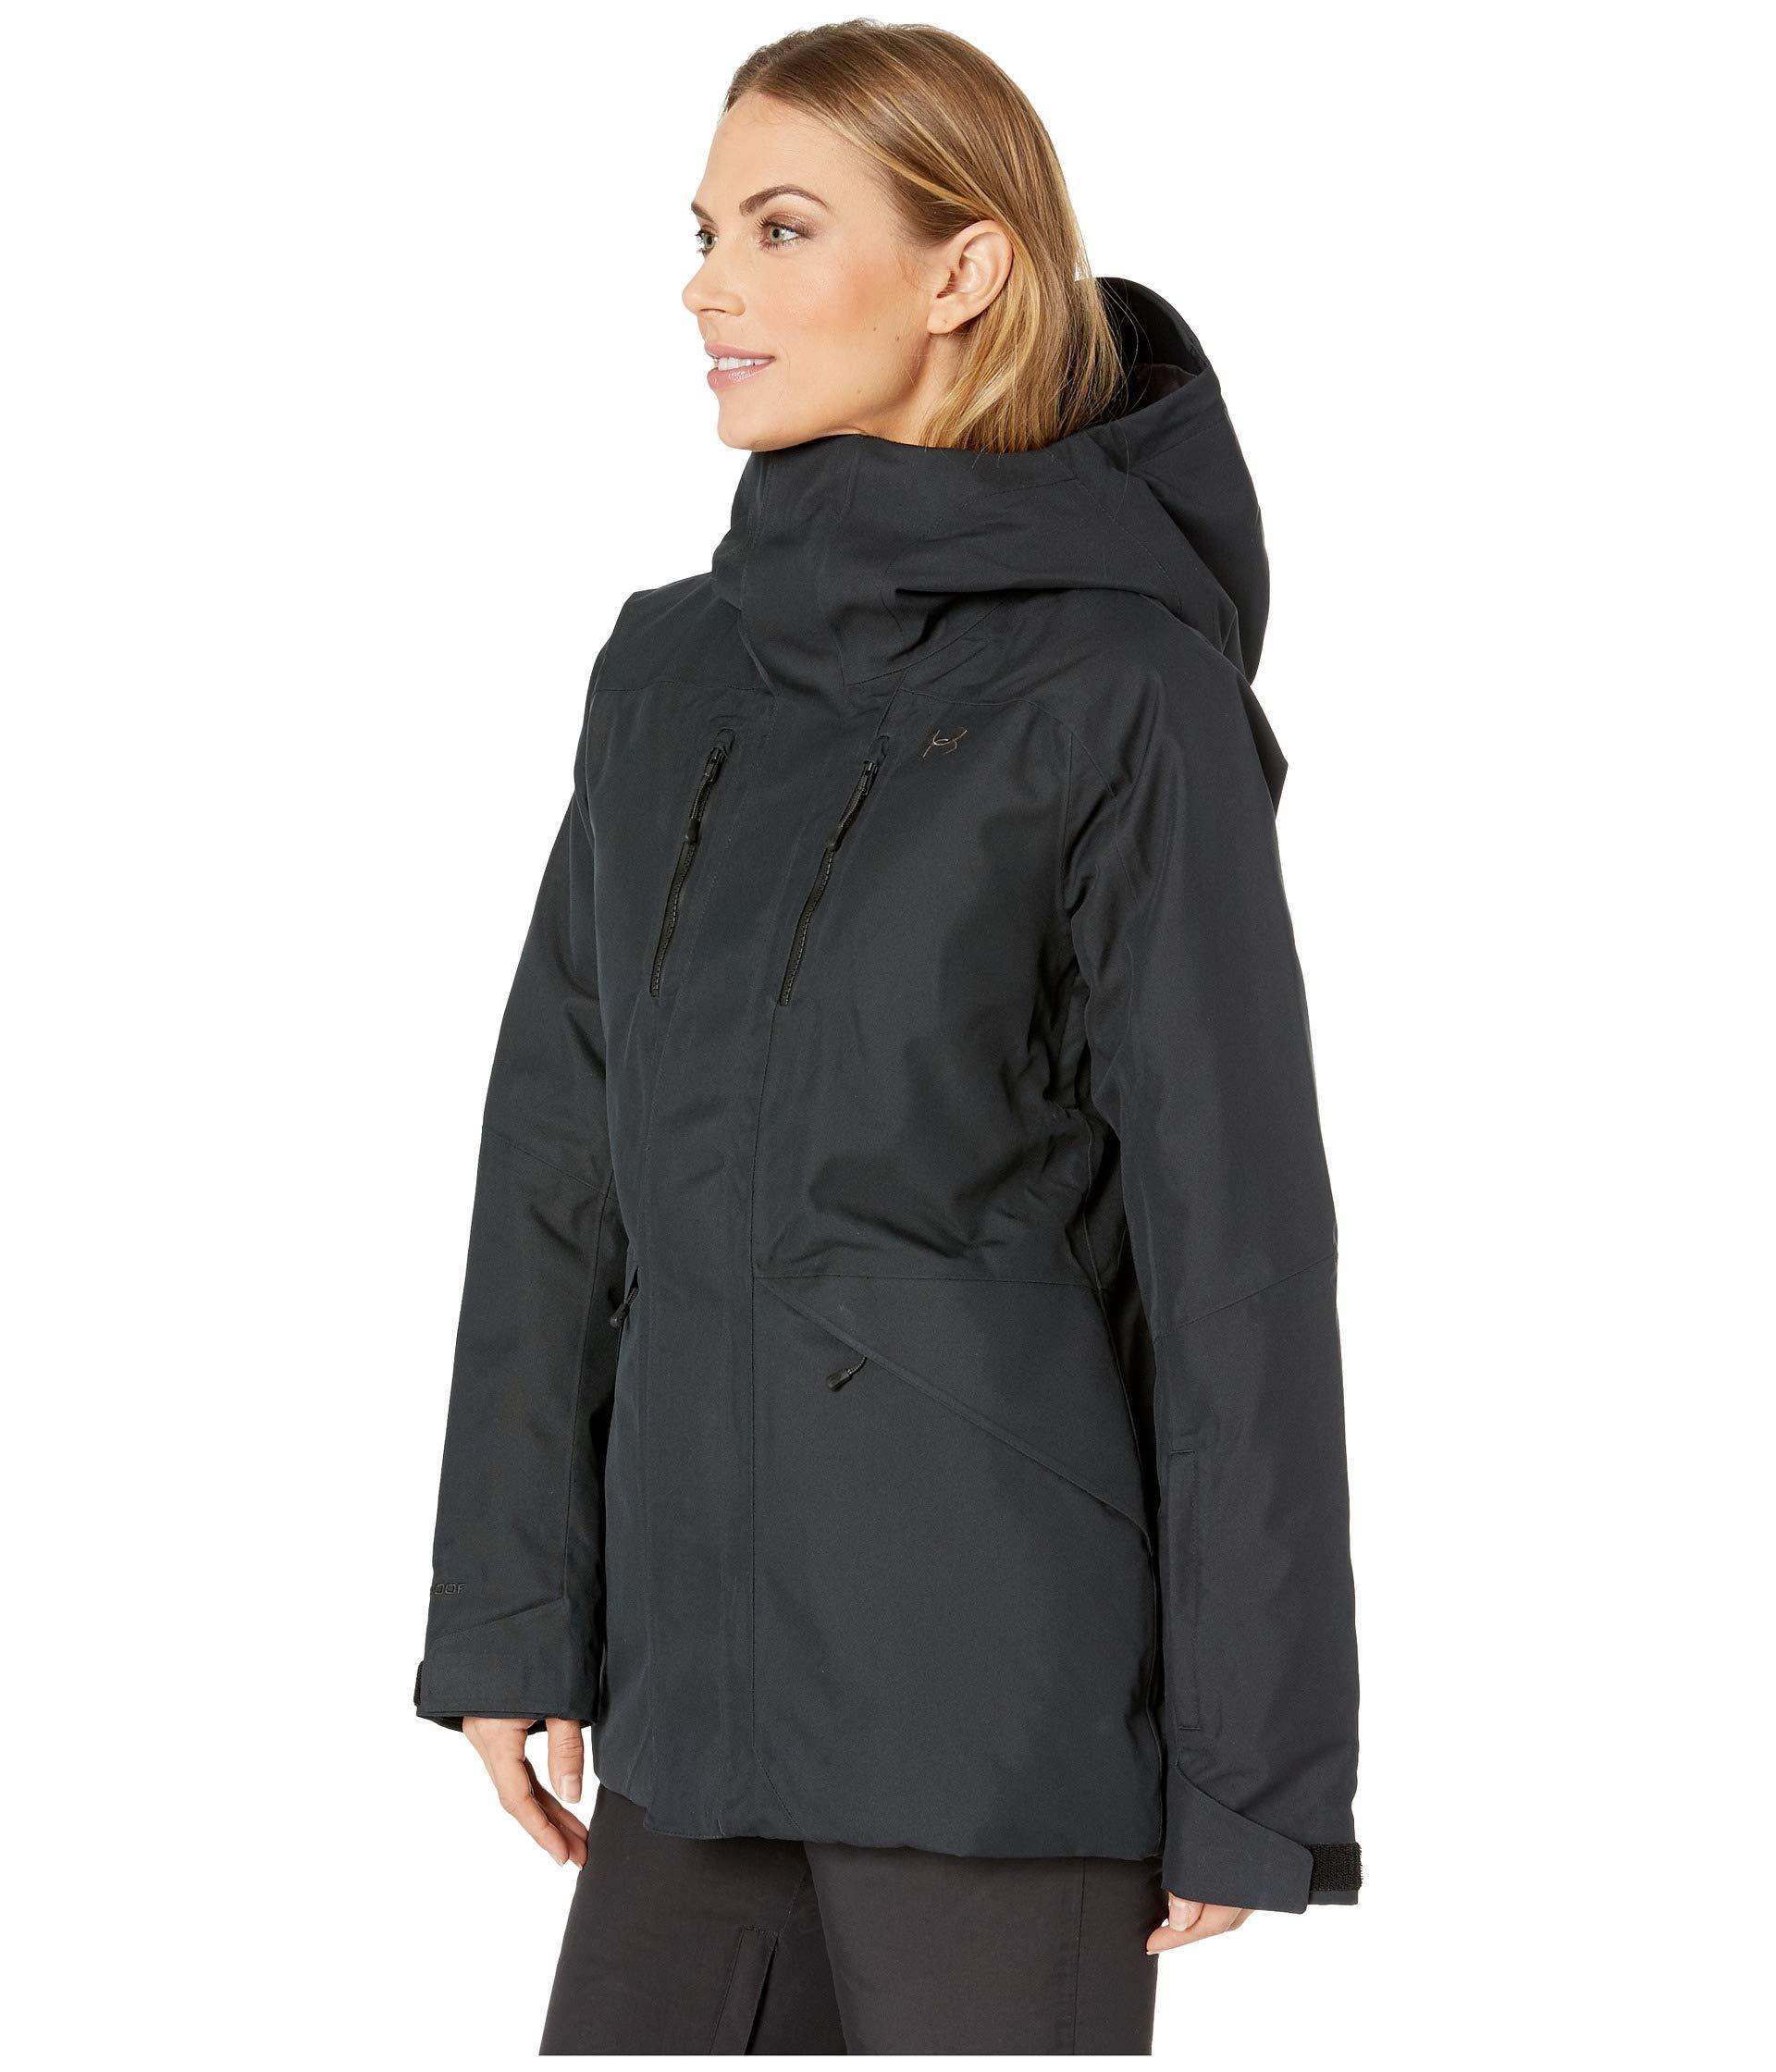 a6d1e23bdfd6f Lyst - Under Armour Ua Emergent Jacket in Black